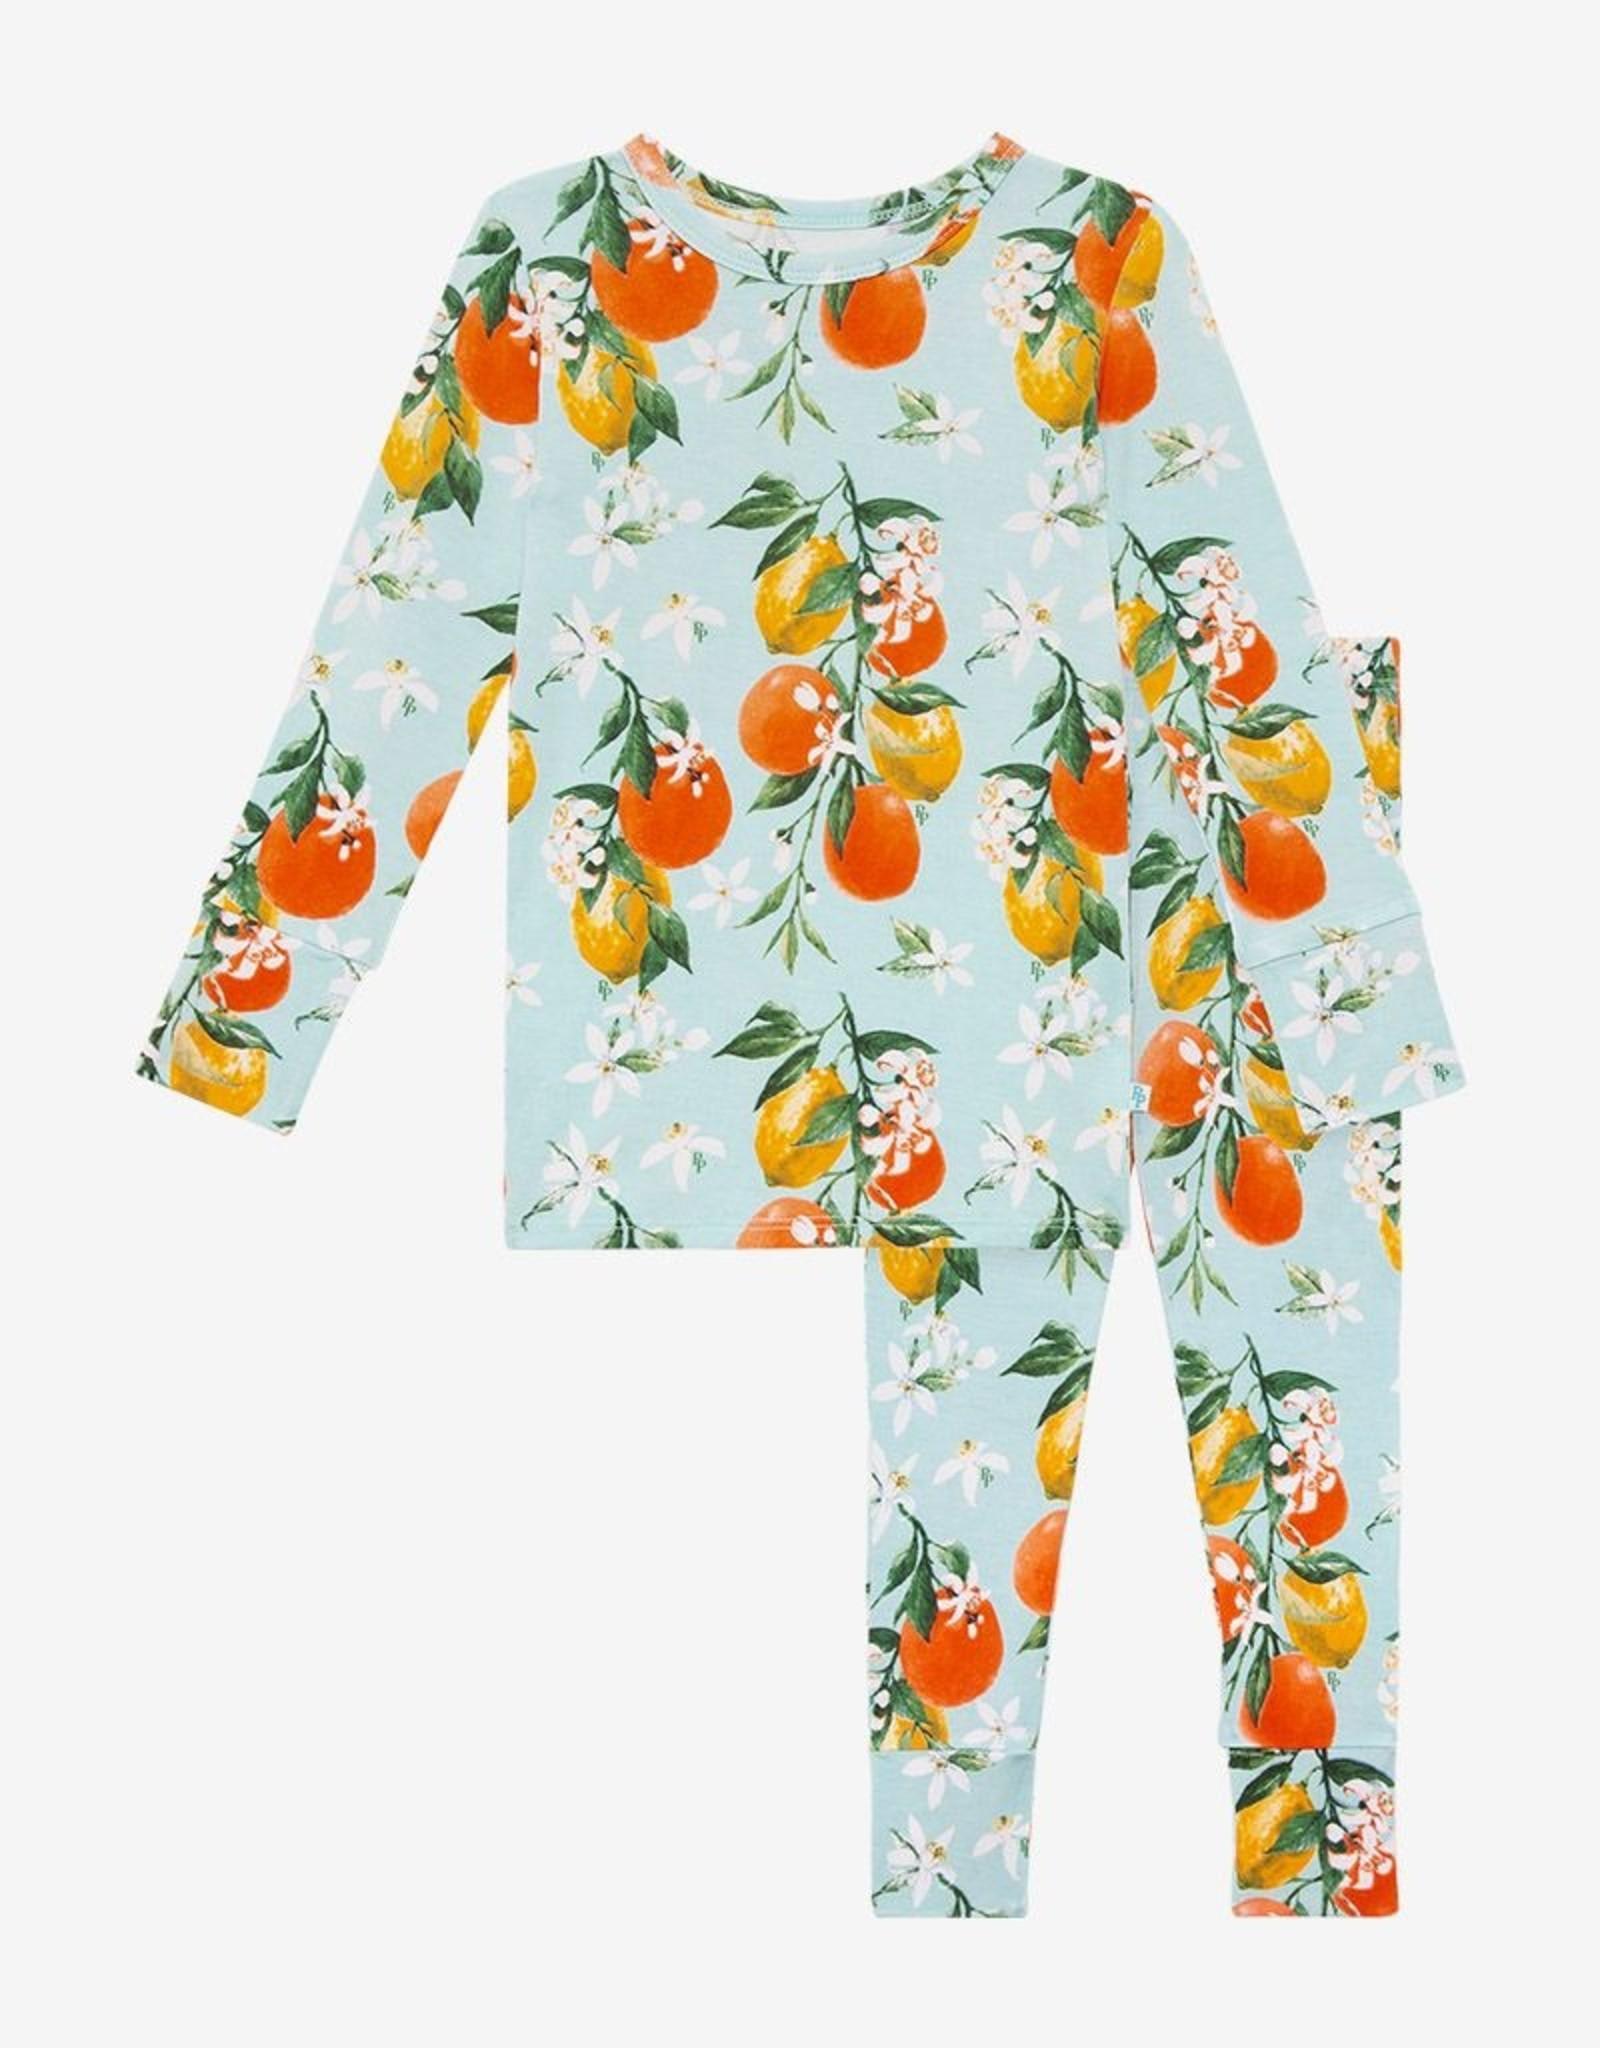 Posh Peanut Mirabella - lng slv Pajamas